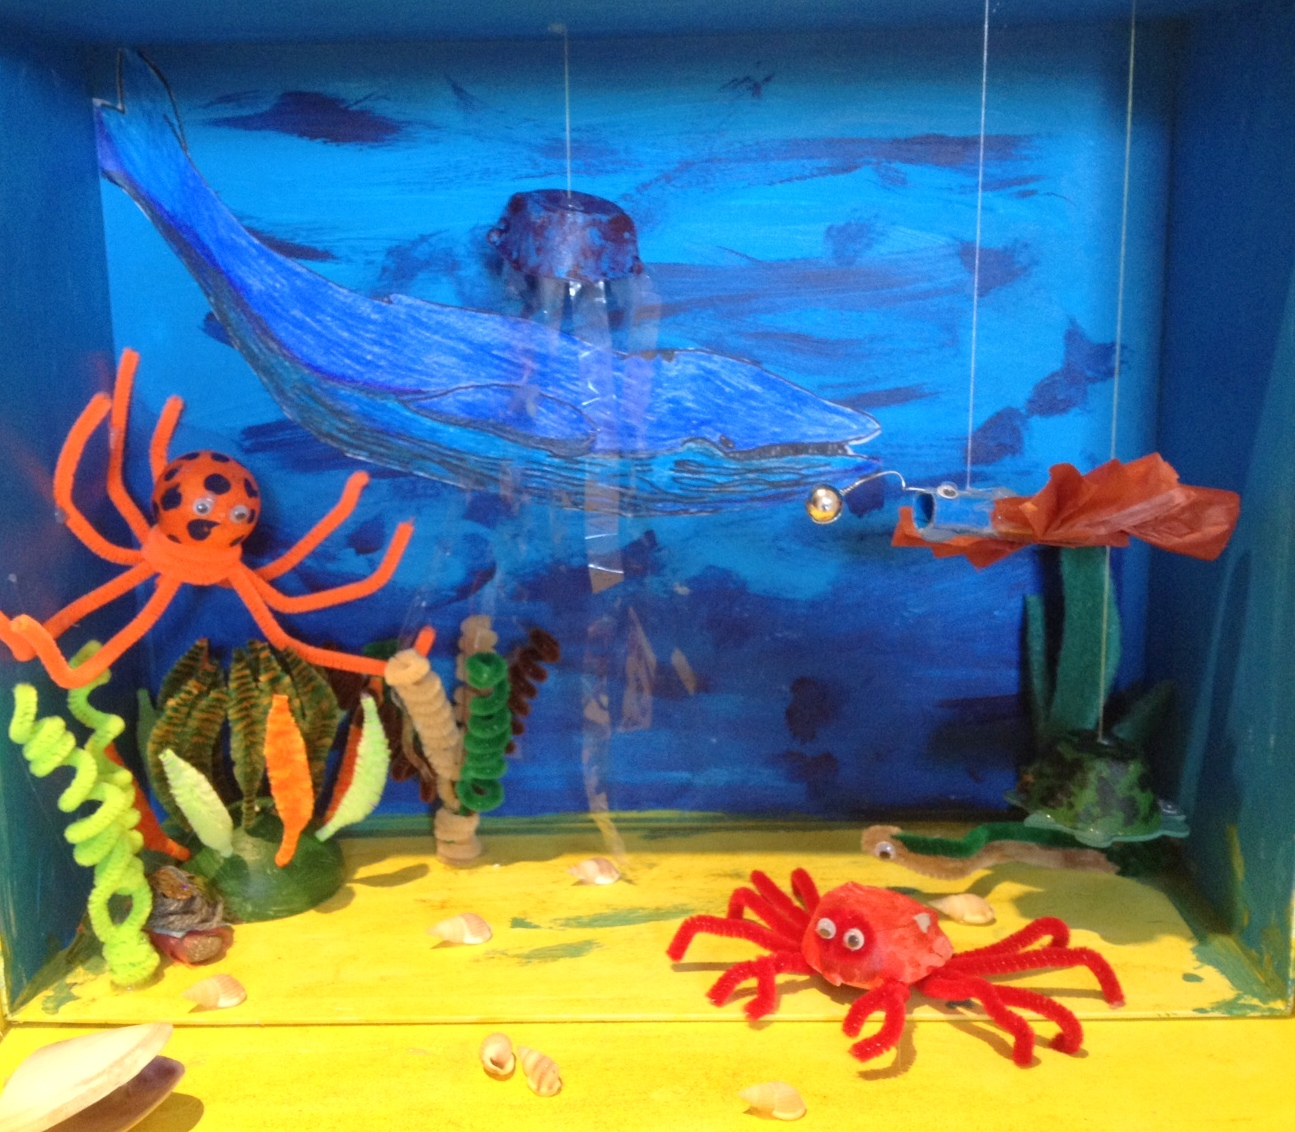 top ocean habitat diorama - photo #33